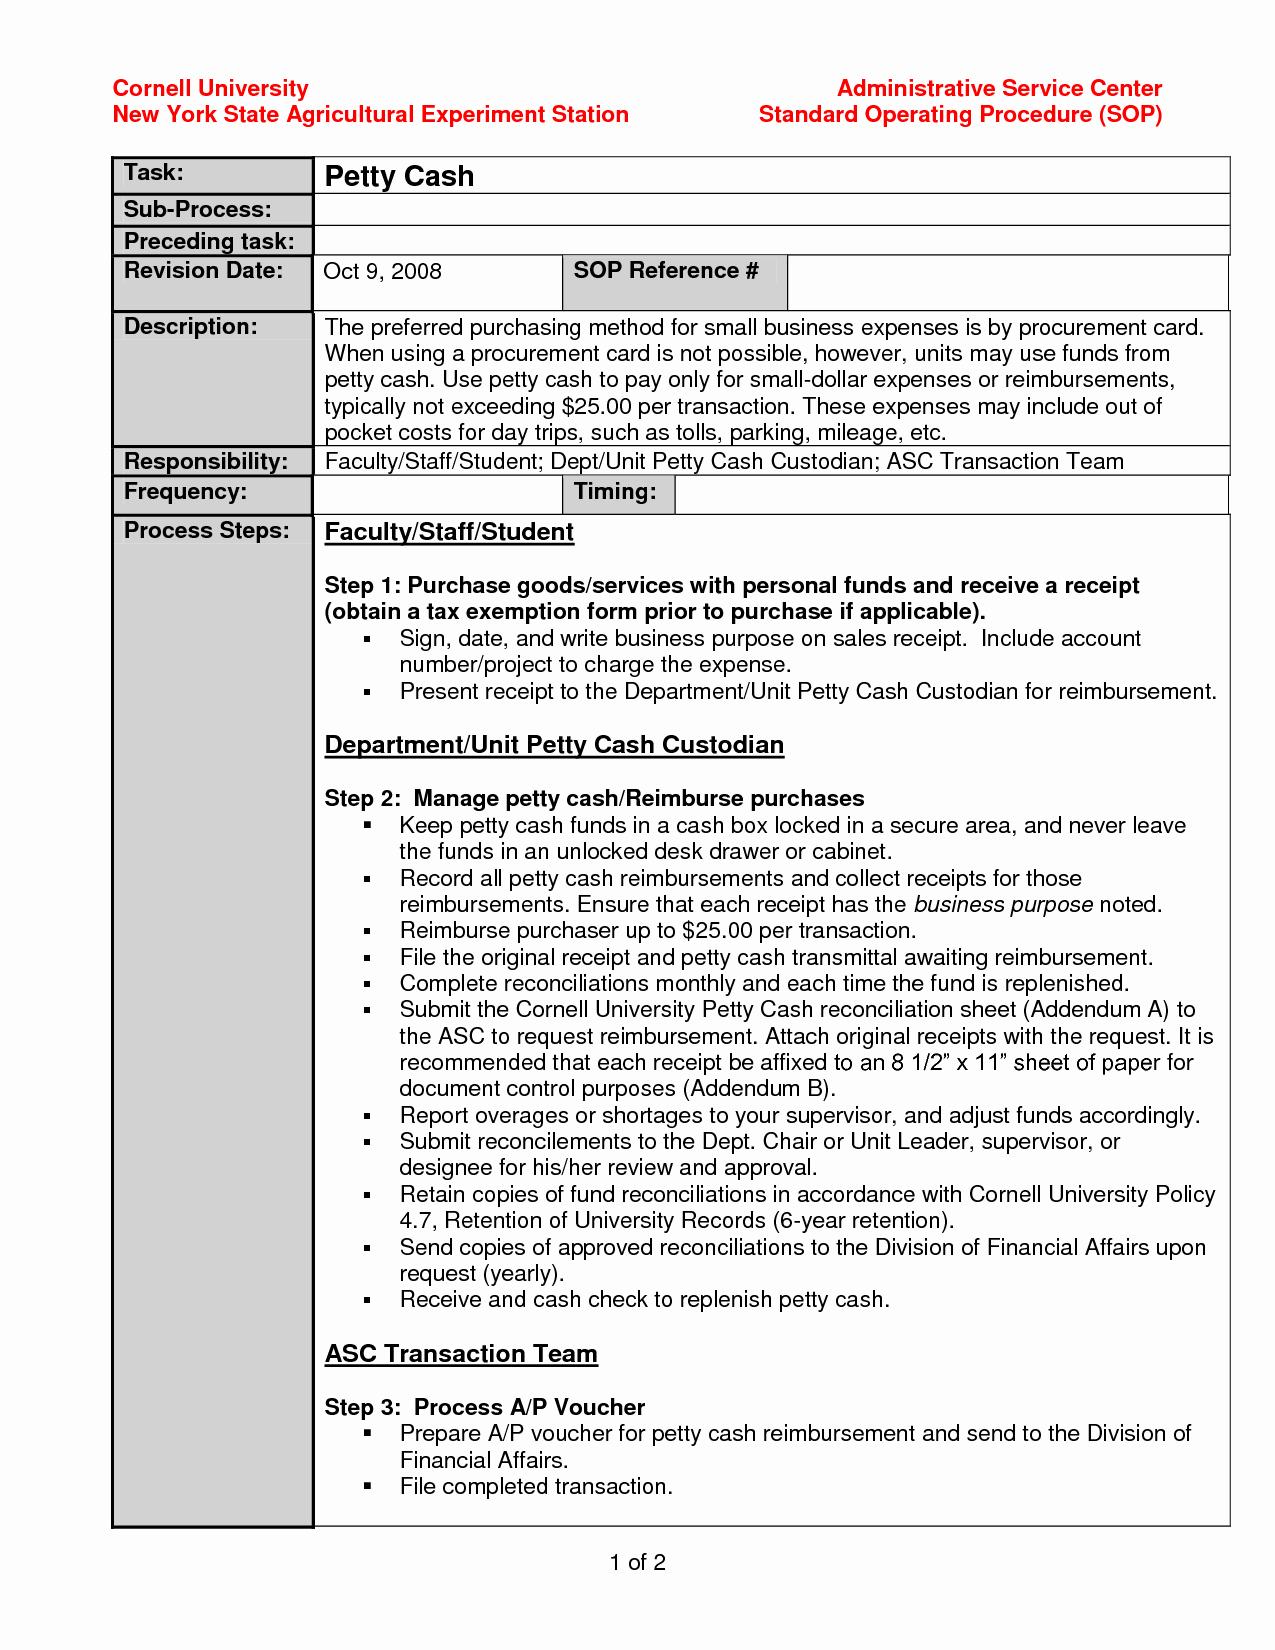 Procedure Manual Template Word Portablegasgrillweber